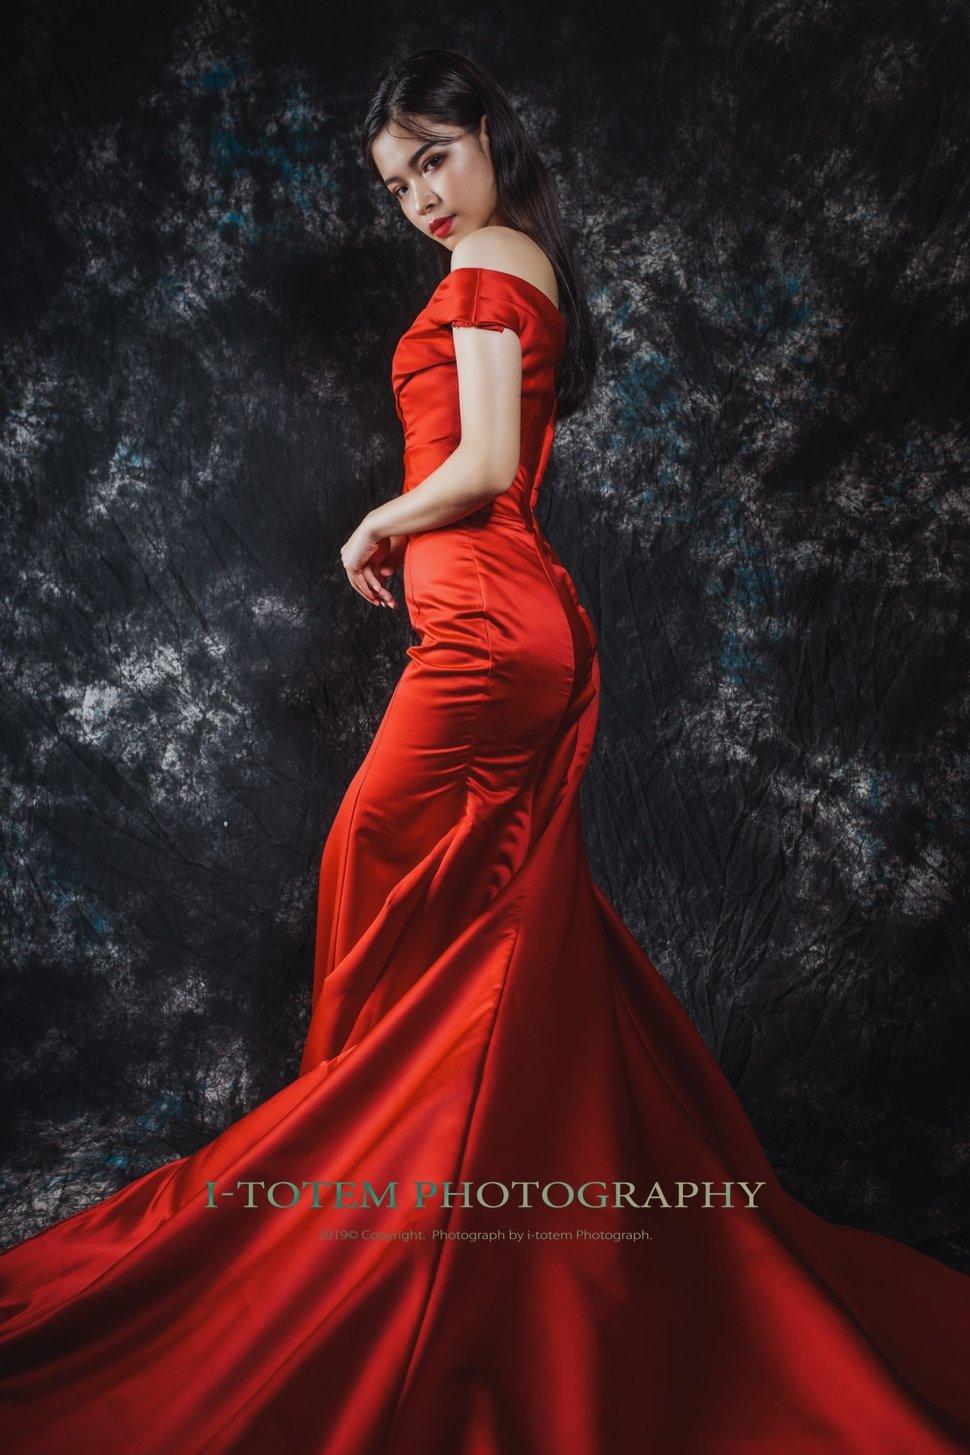 20190310_190322_0040 - Zona時尚美甲x新娘秘書整體造型工作室《結婚吧》